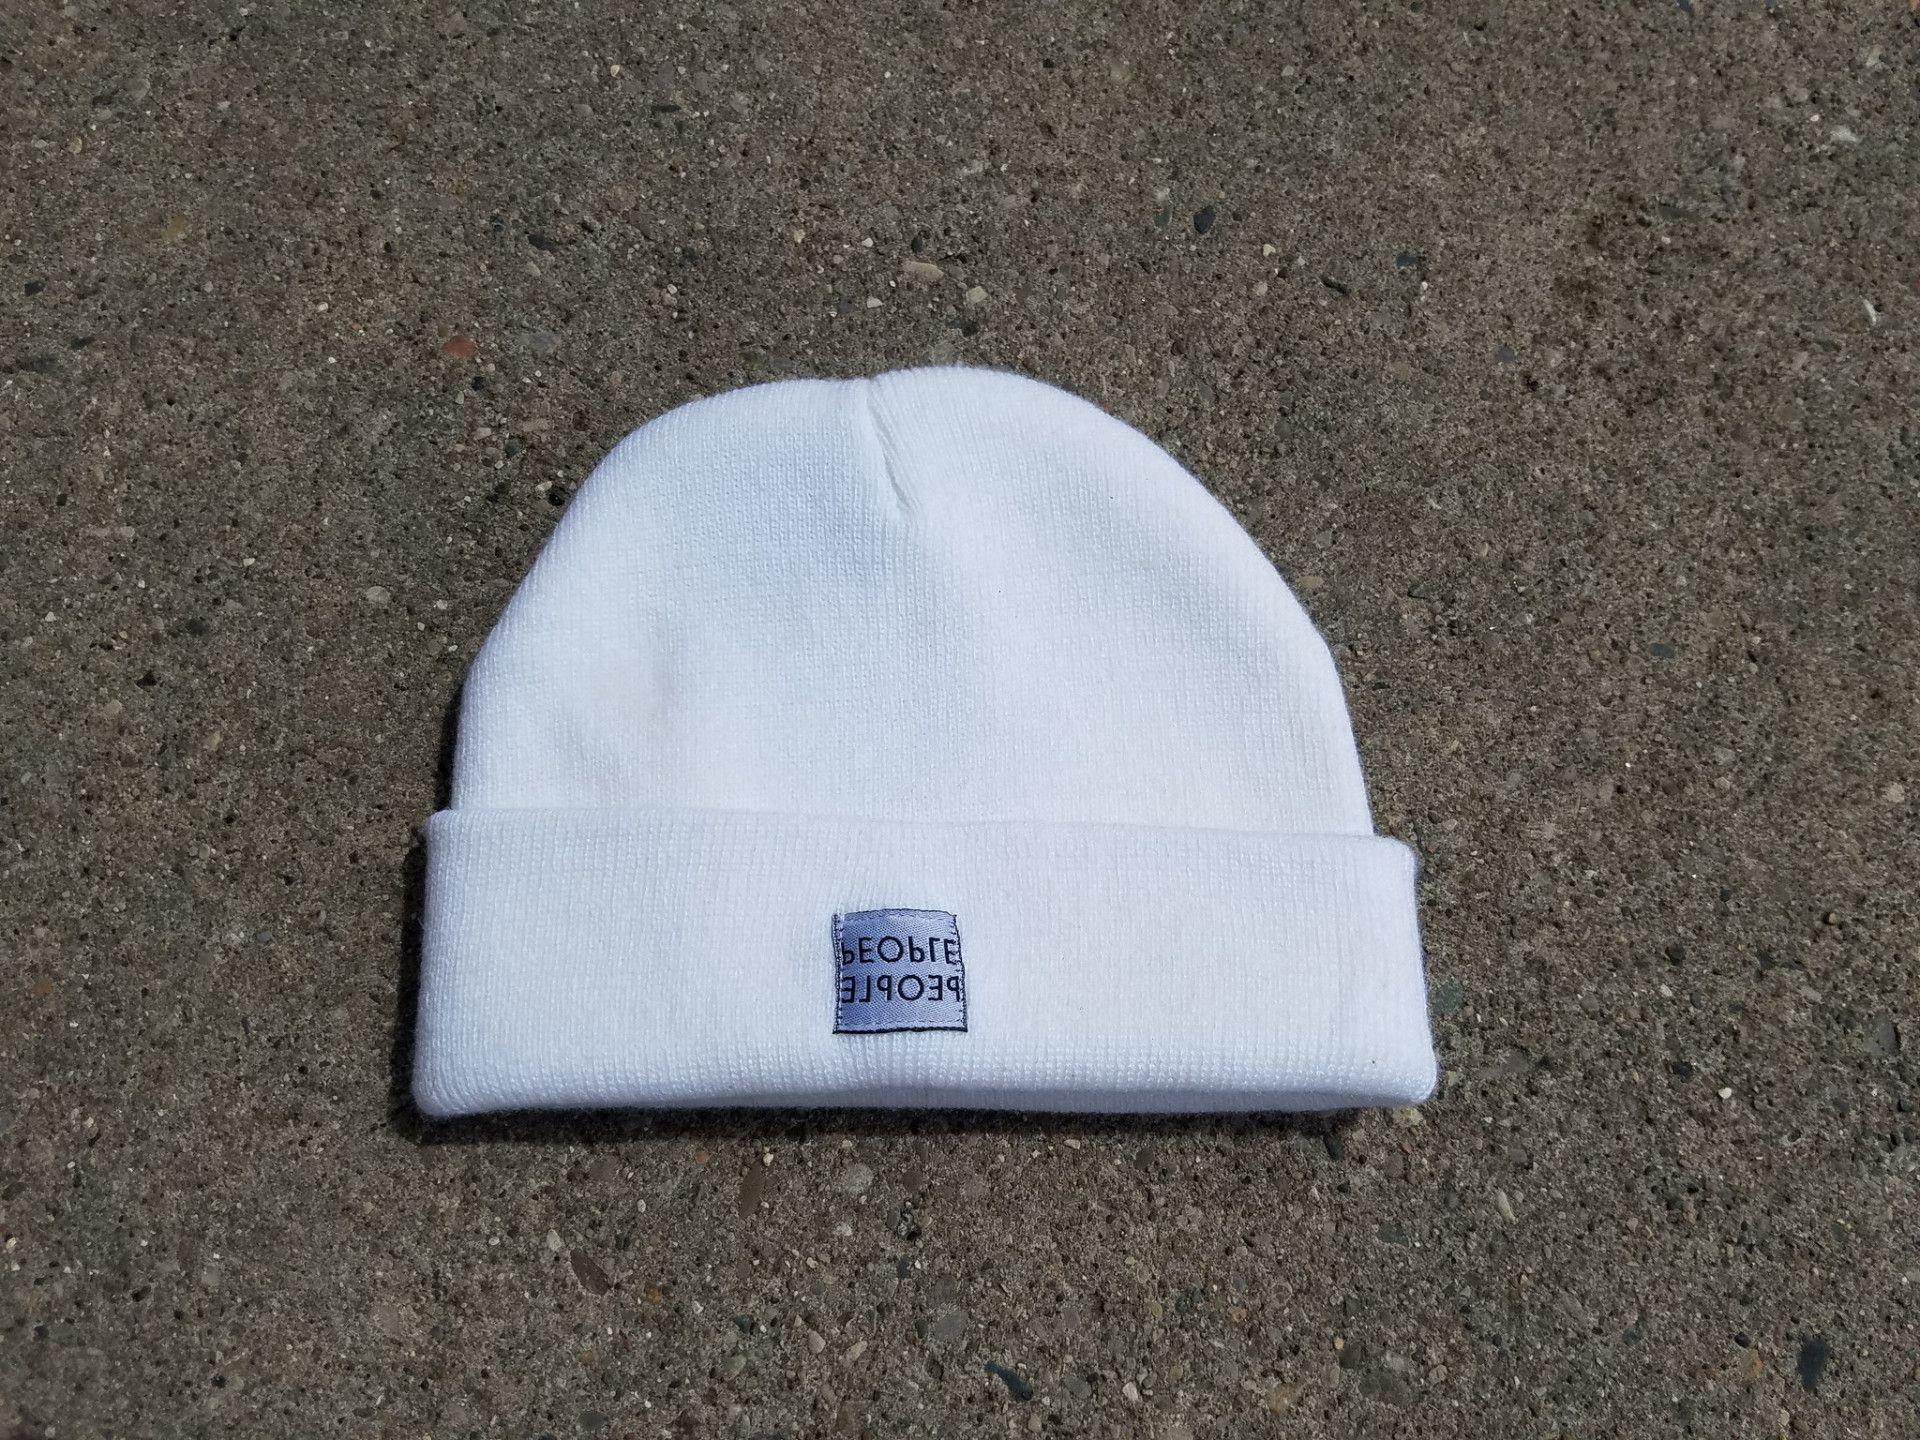 People Mirrored Reverse Label Beanie Cap white